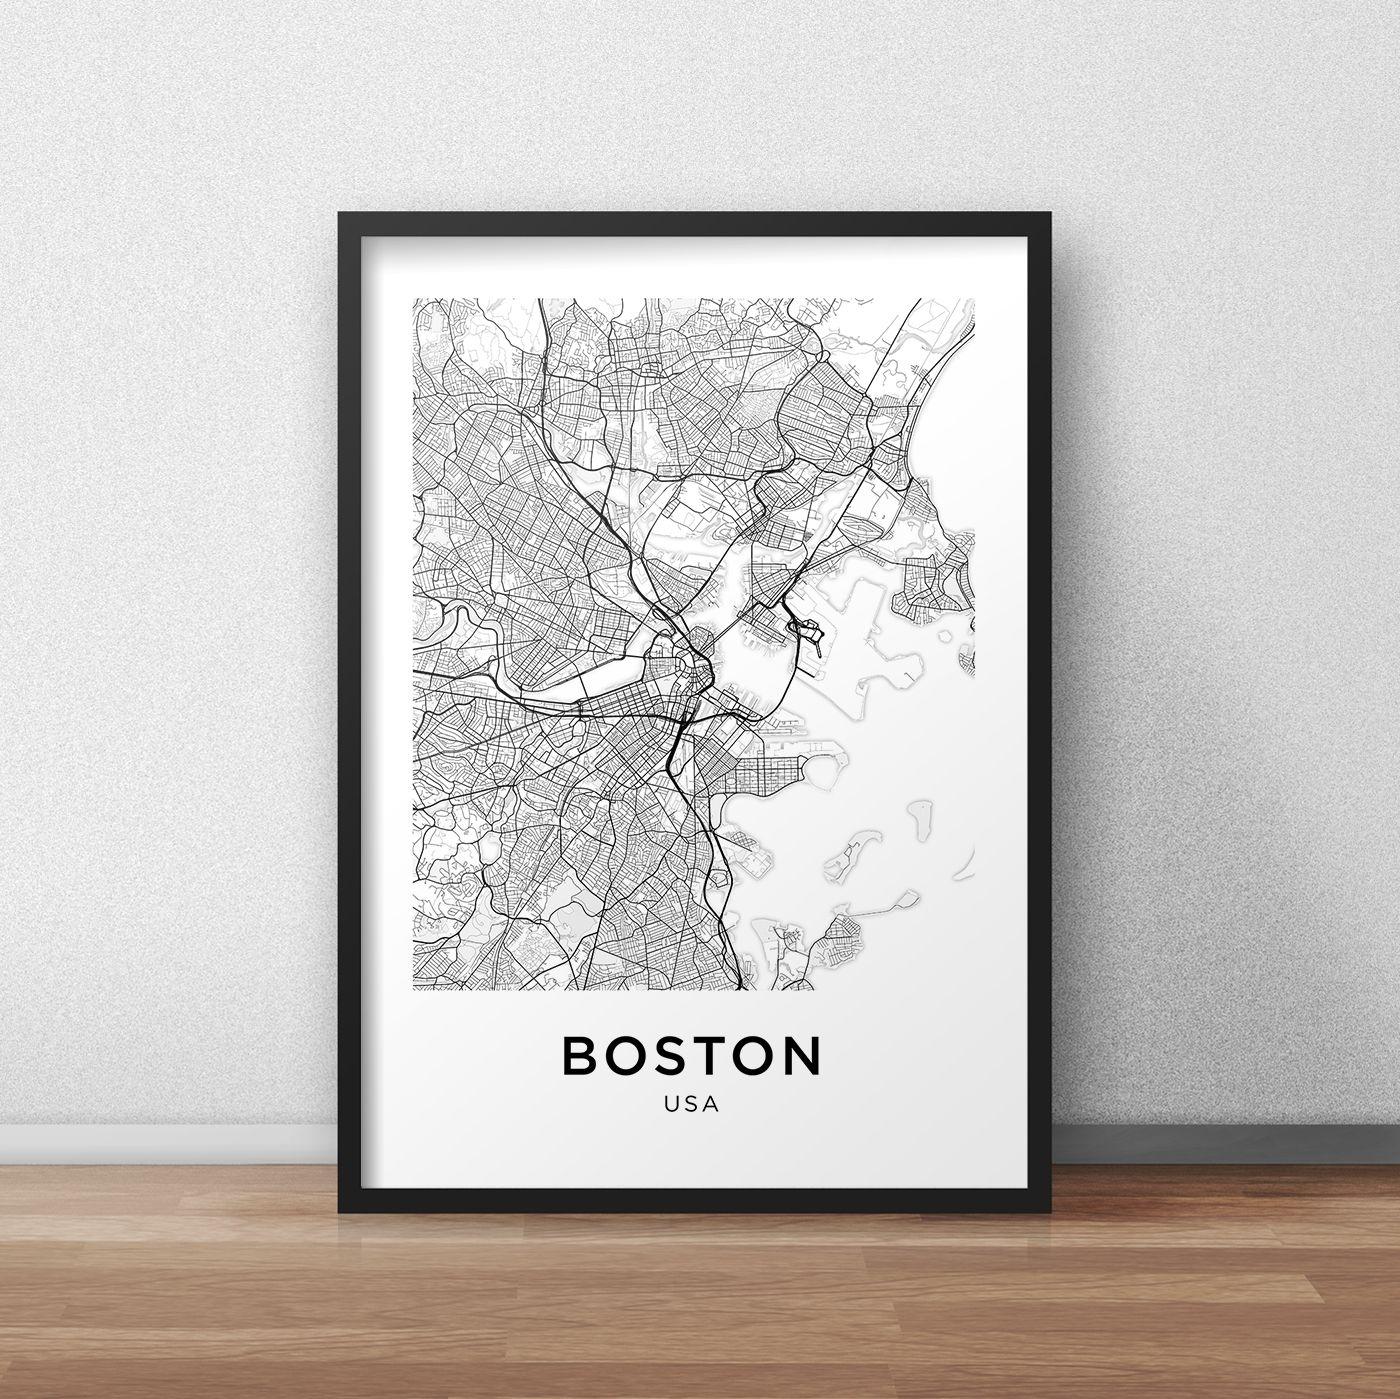 Boston Map Print, Printable Boston Map, Boston City Map, Boston For Most Recent Boston Wall Art (View 4 of 20)